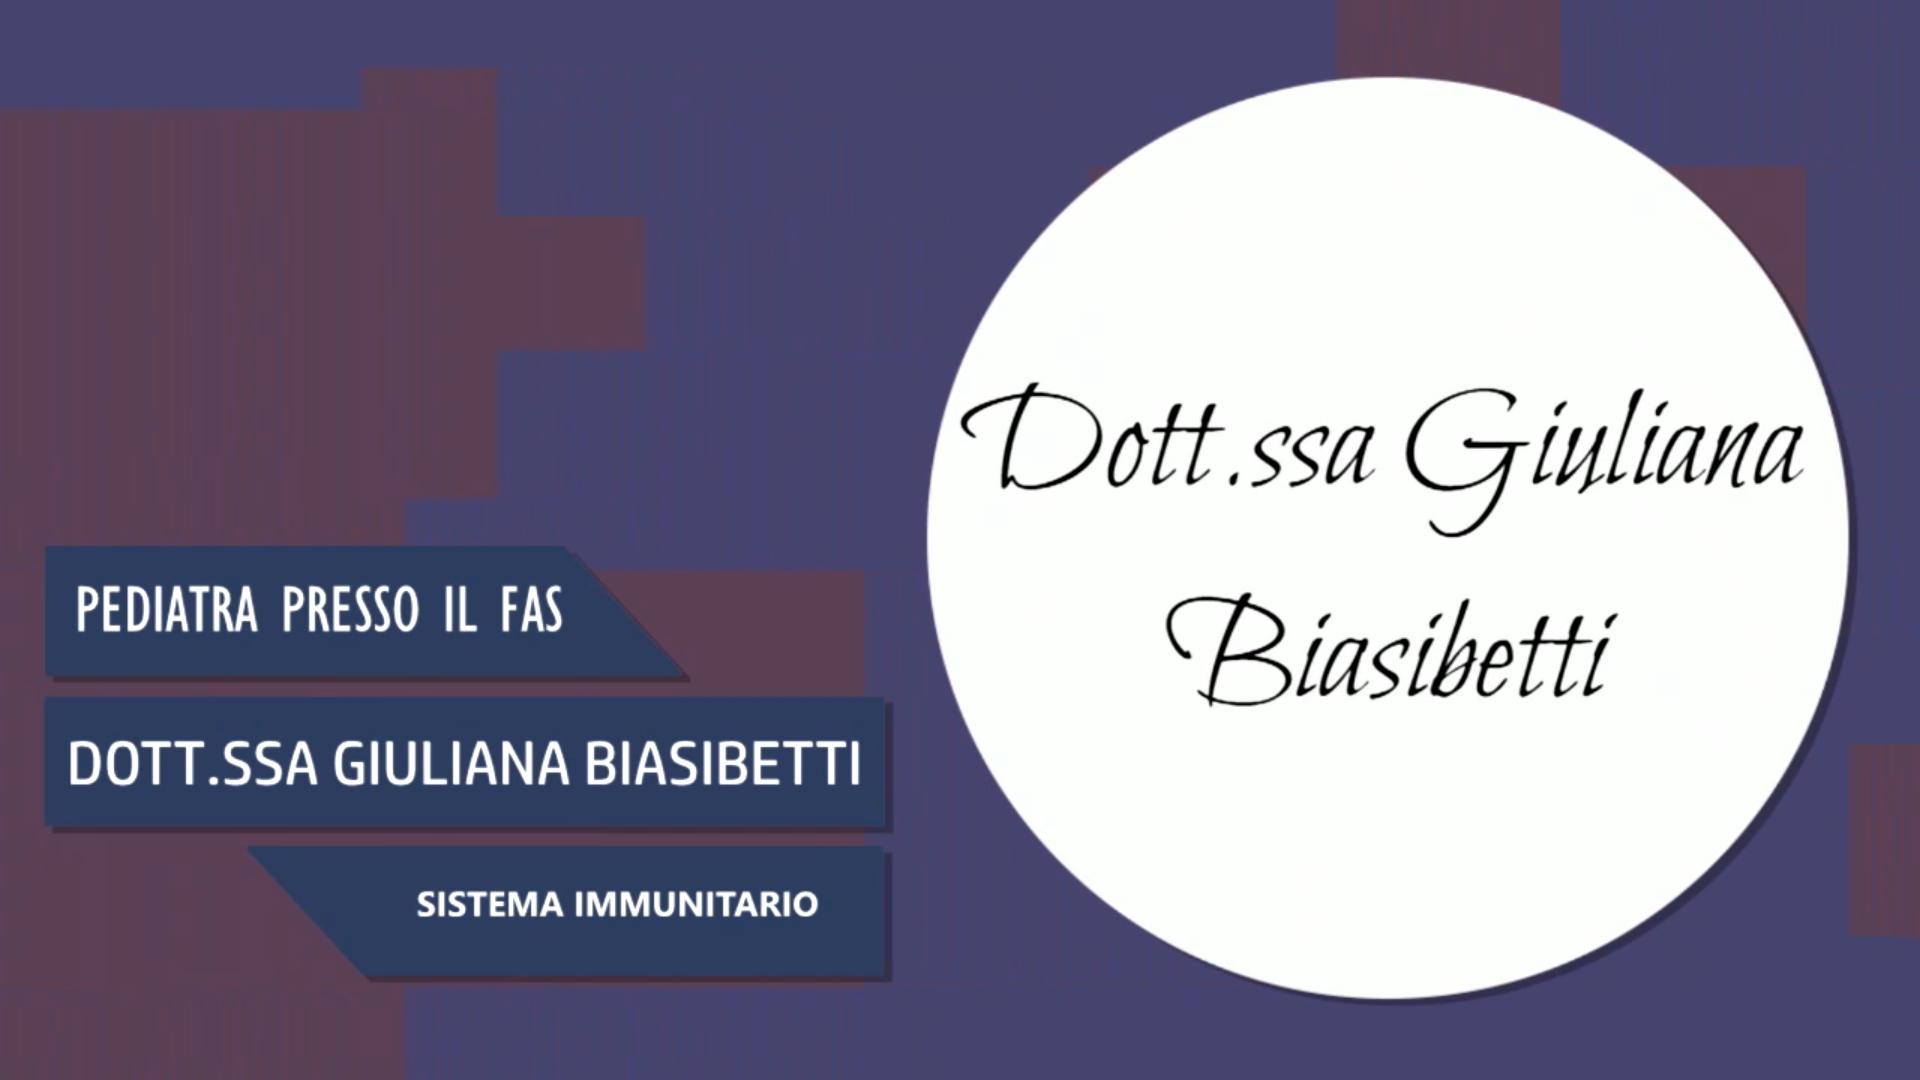 Intervista alla Dott.ssa Giuliana Biasibetti – Sistema immunitario